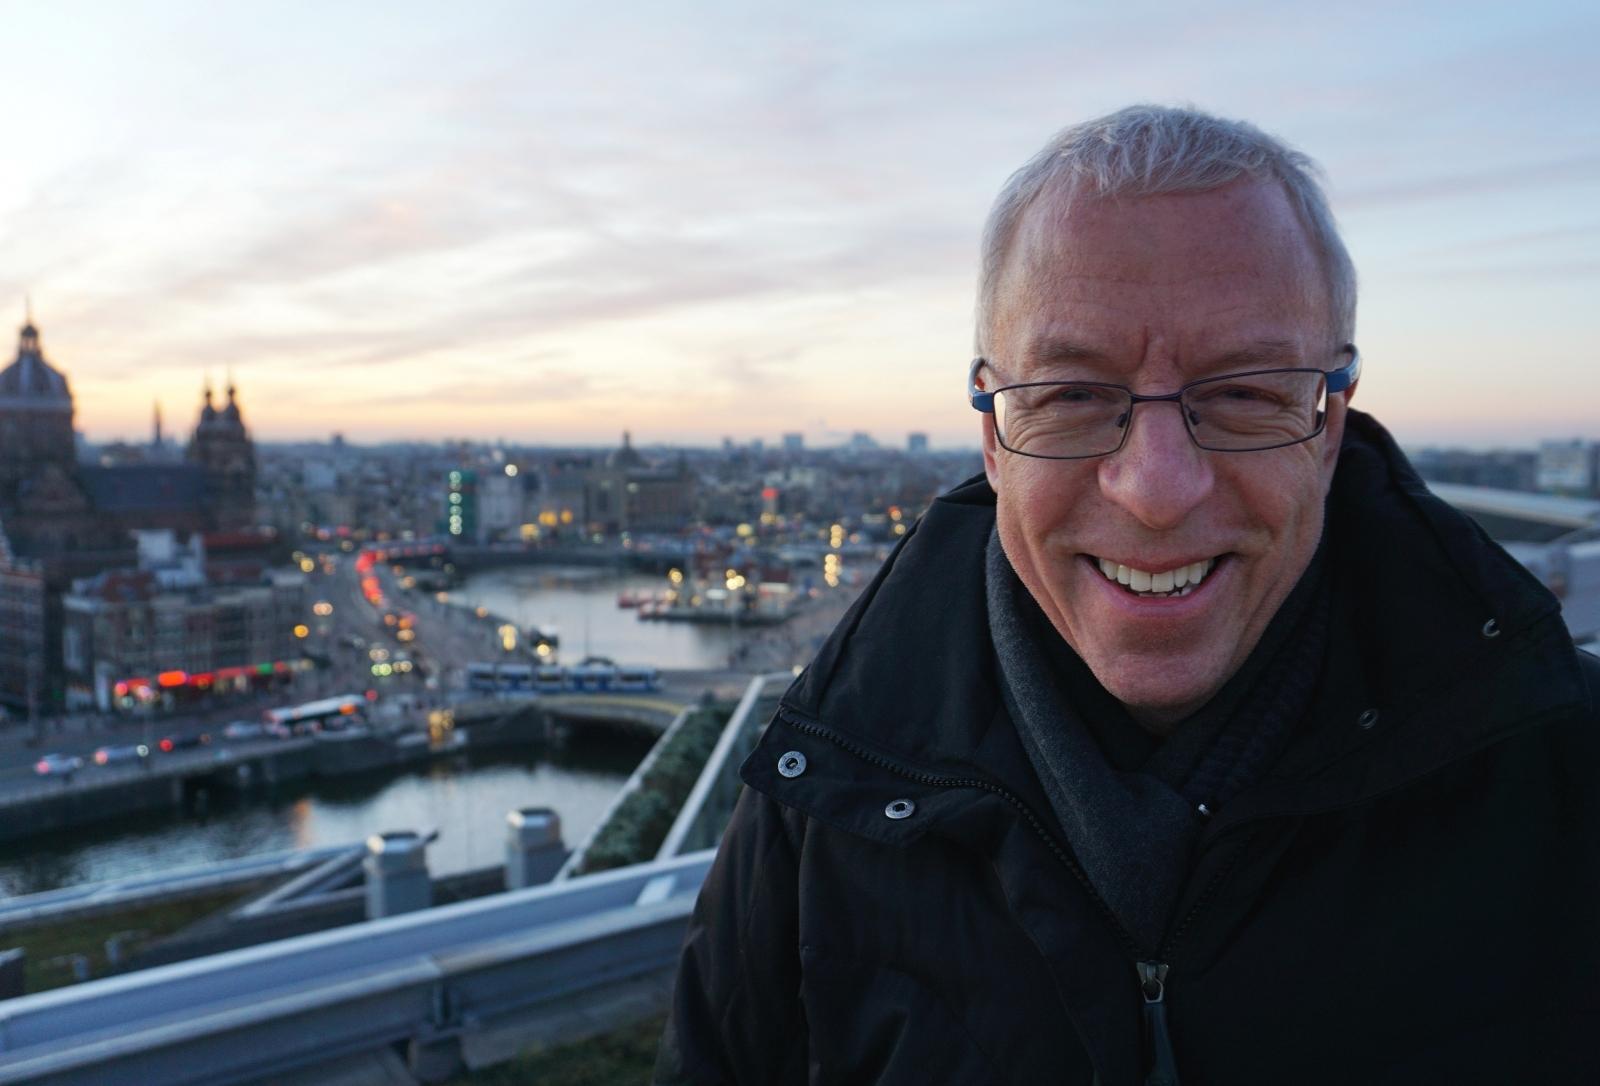 Stephen Huyton in Netherlands Brexit challenge